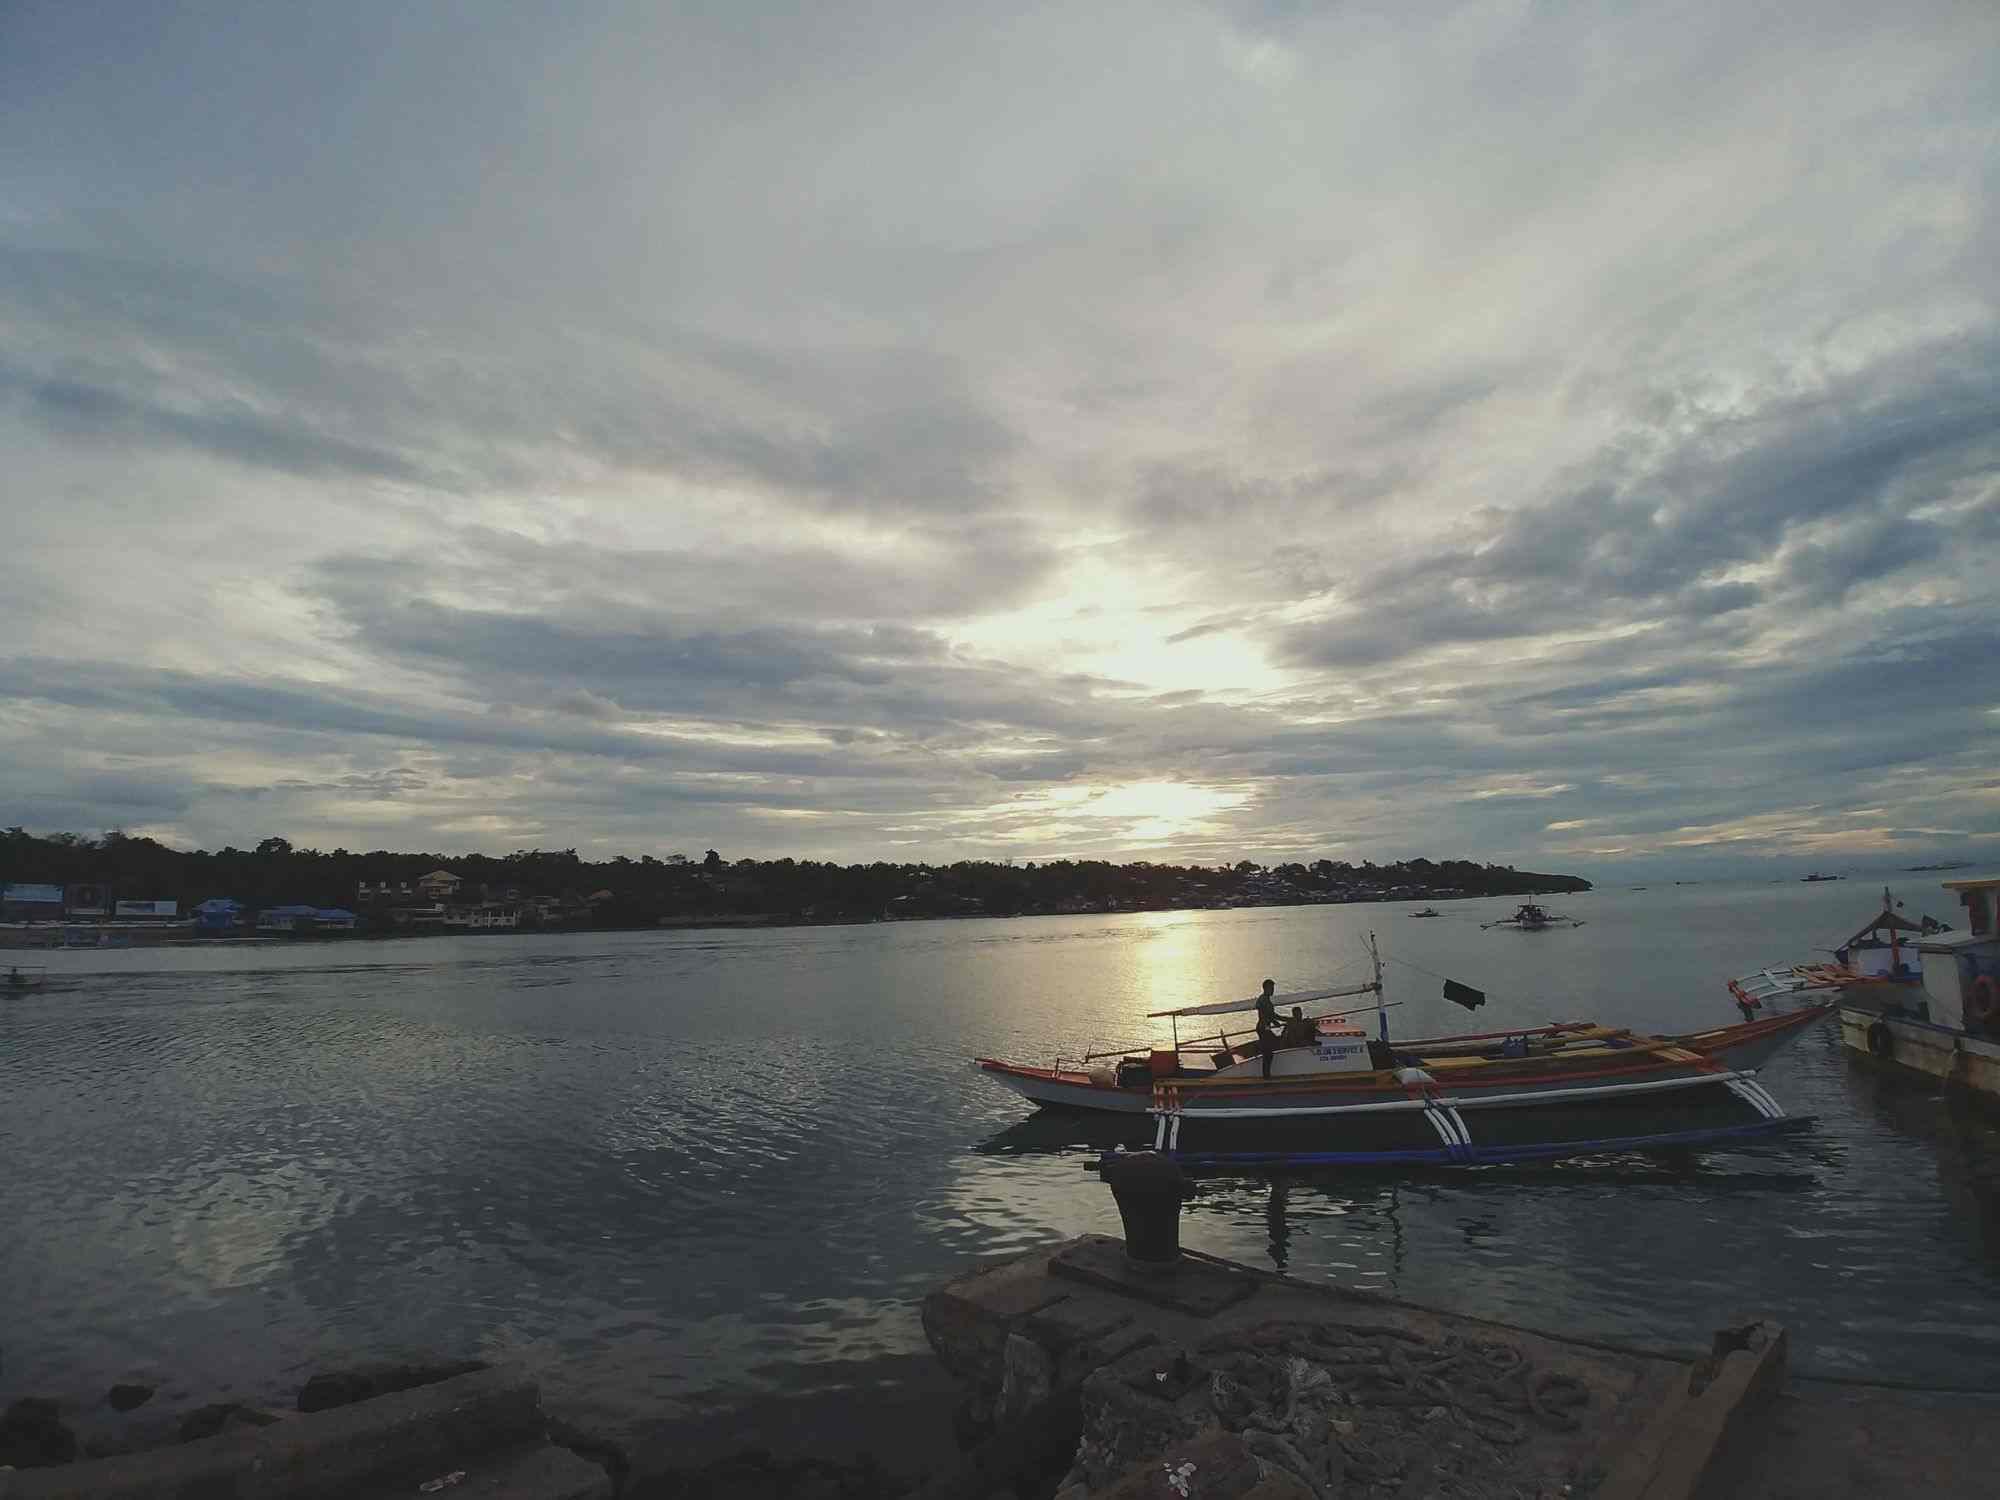 Boats in Panglao, Bohol